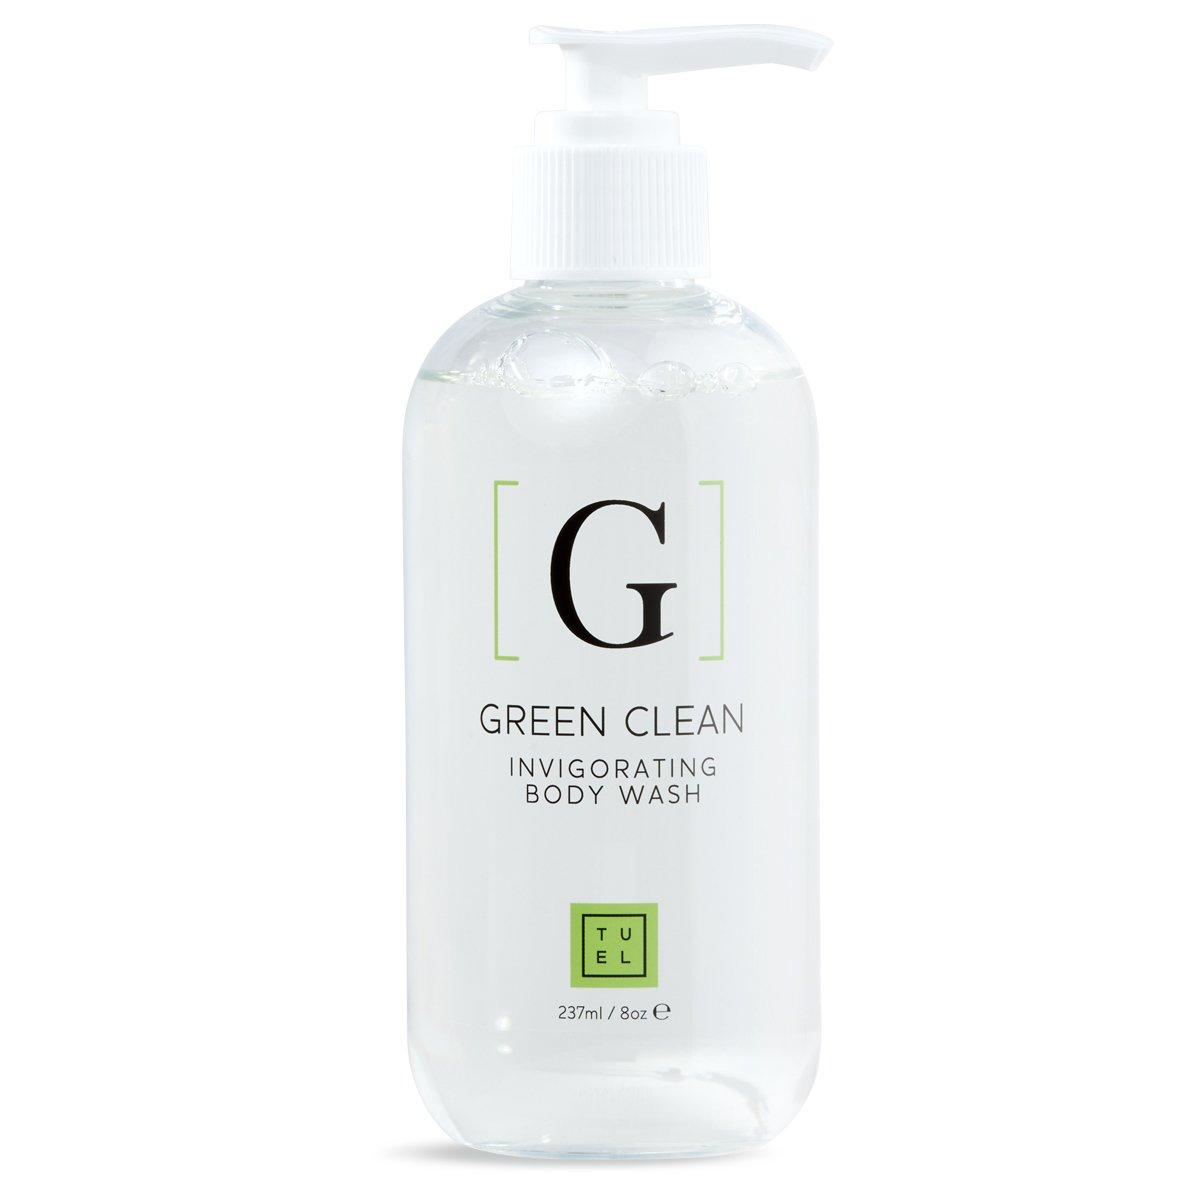 Green Clean Invigorating Body Wash